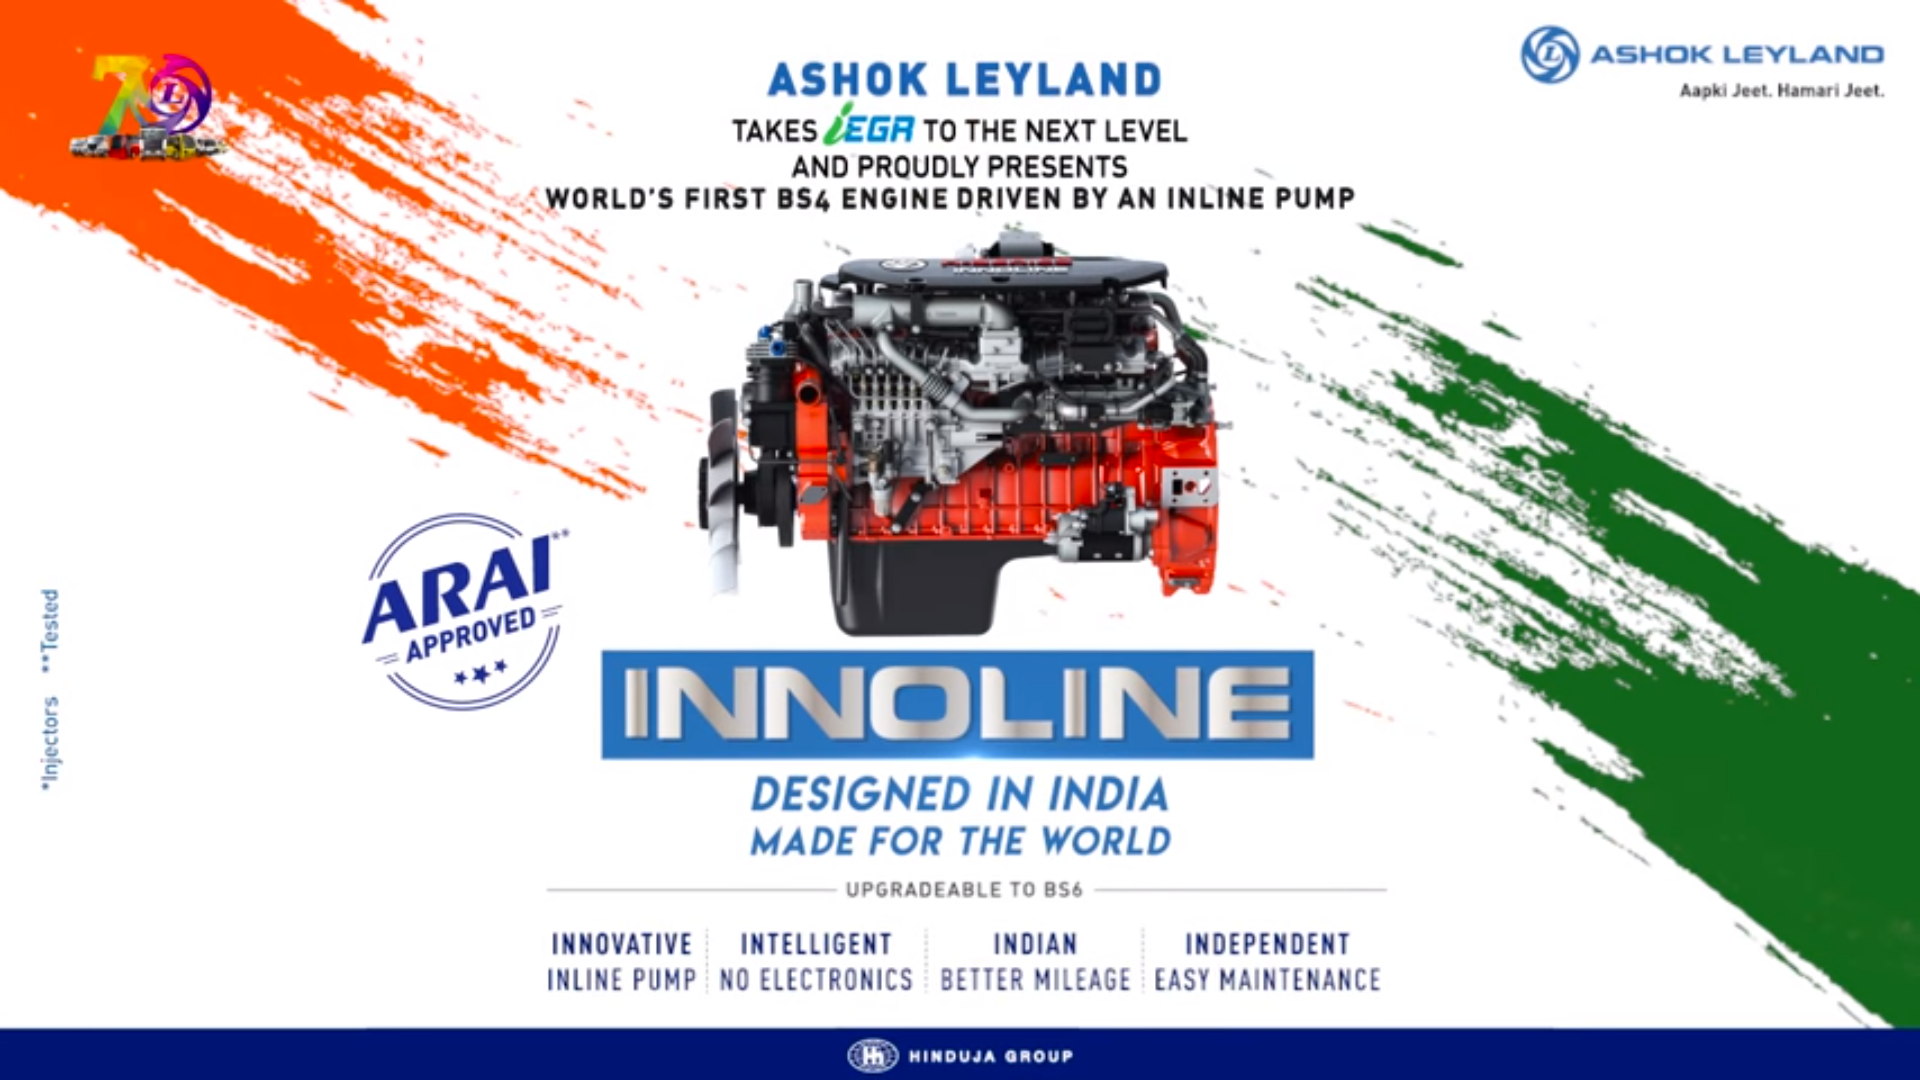 Ashok Leyland Innoline